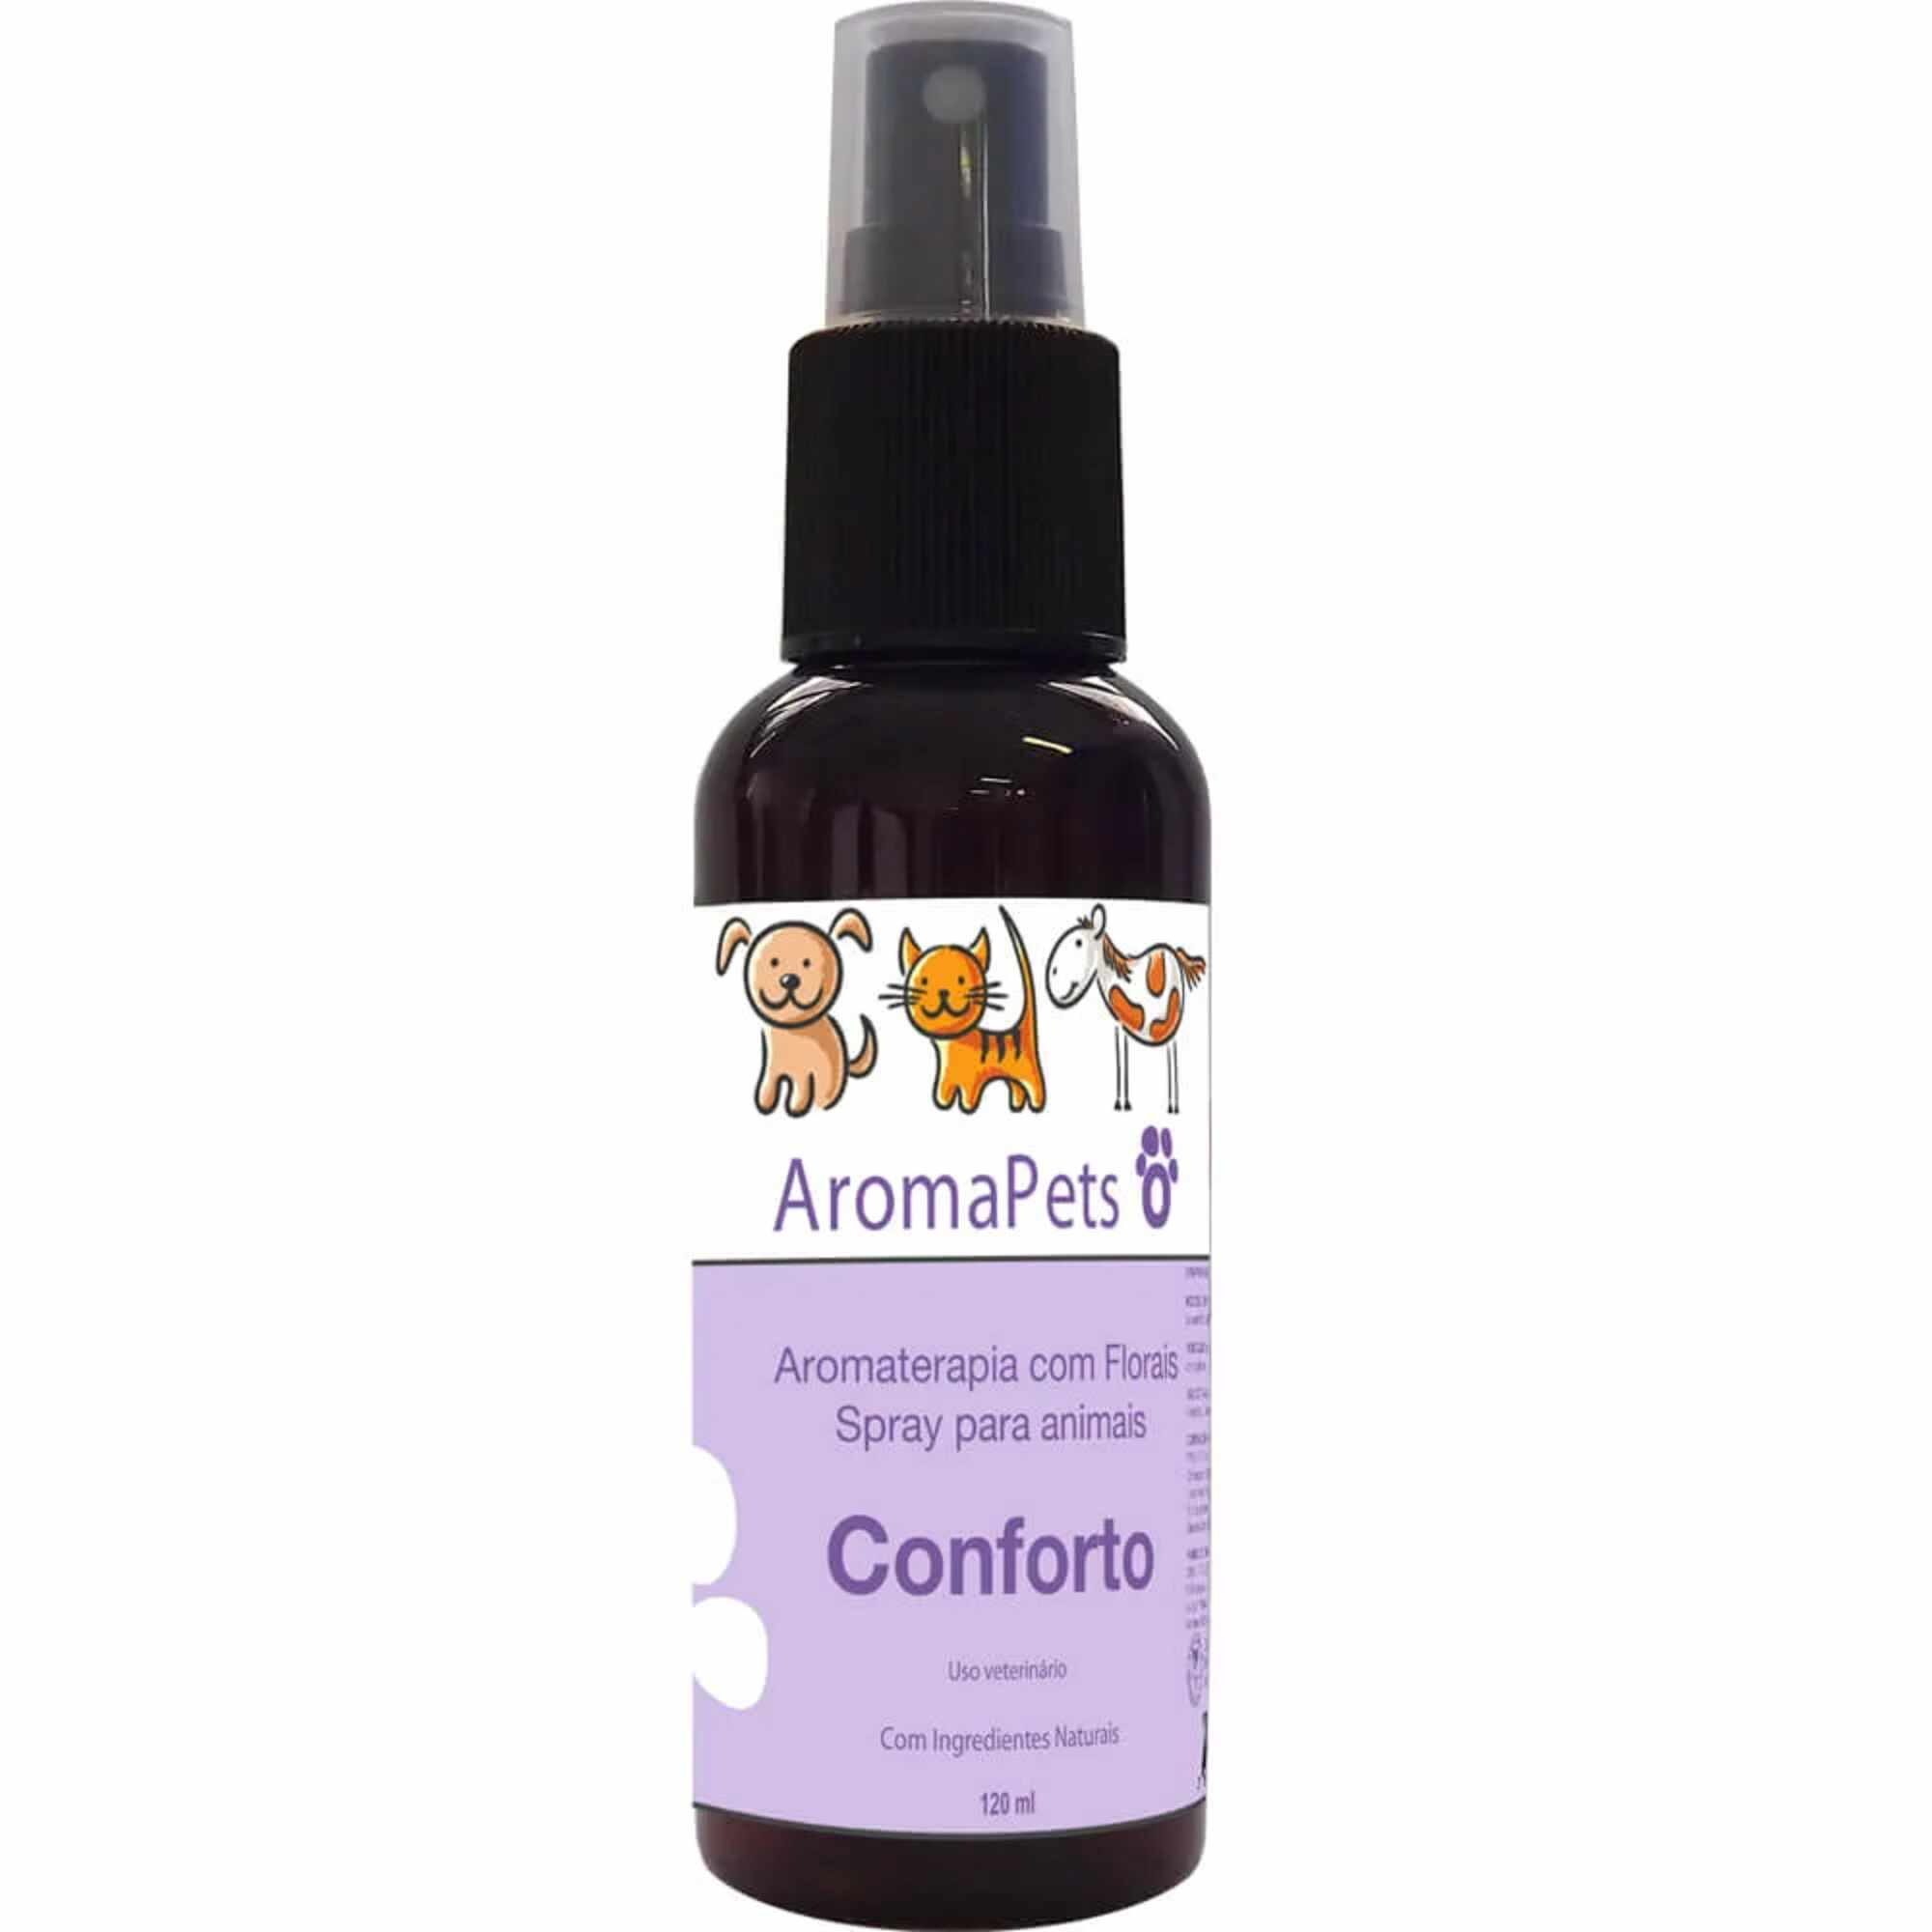 Aroma Pet Confort 120mL By Samia